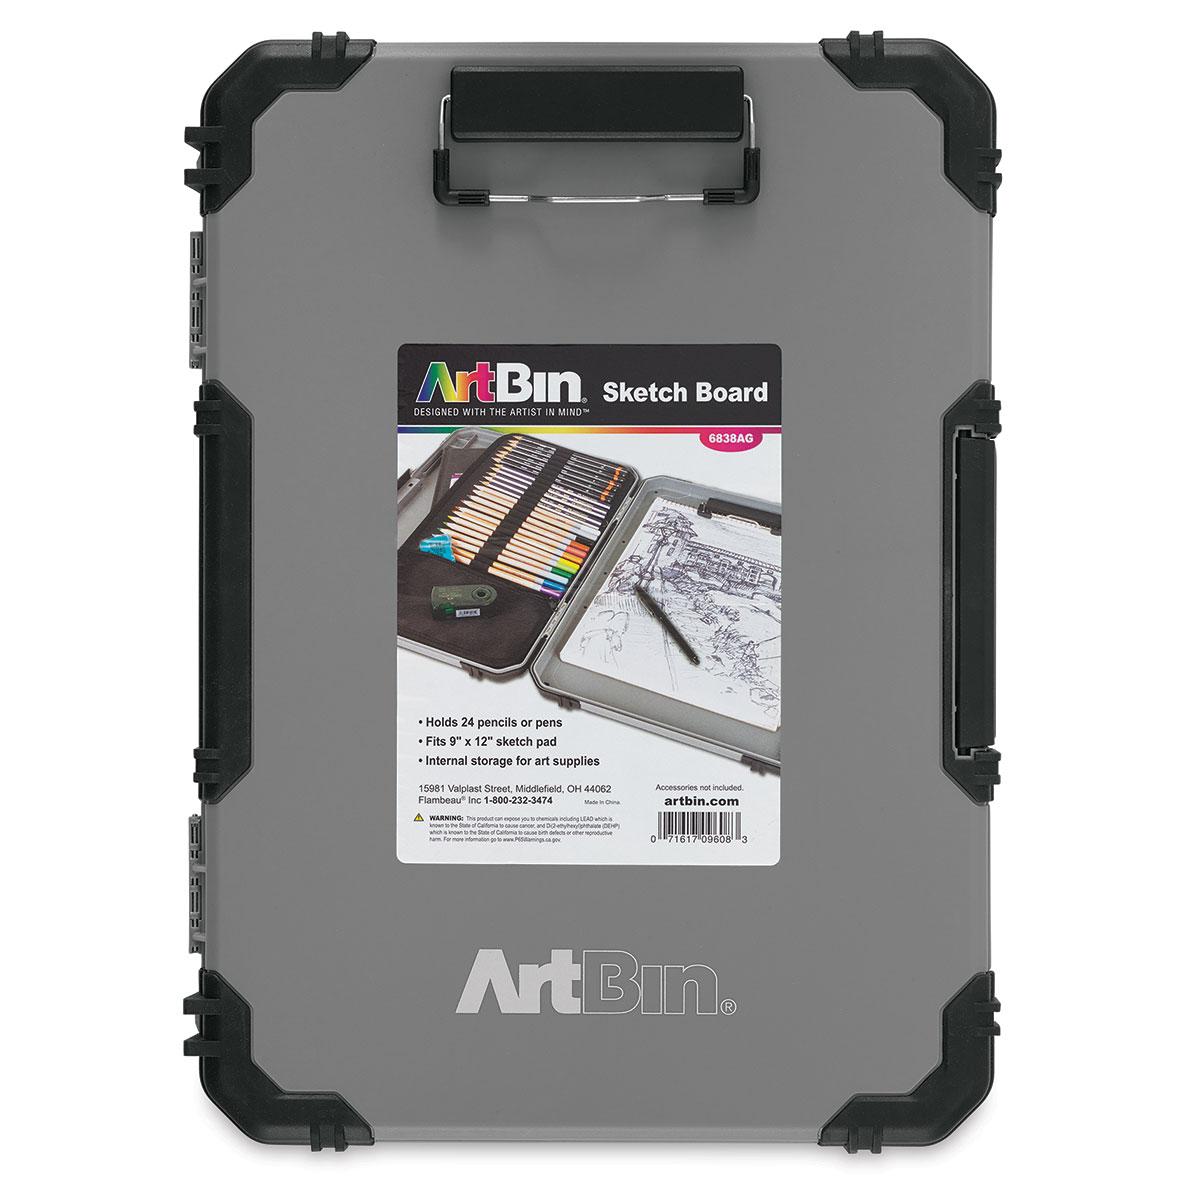 ArtBin Sketch Board